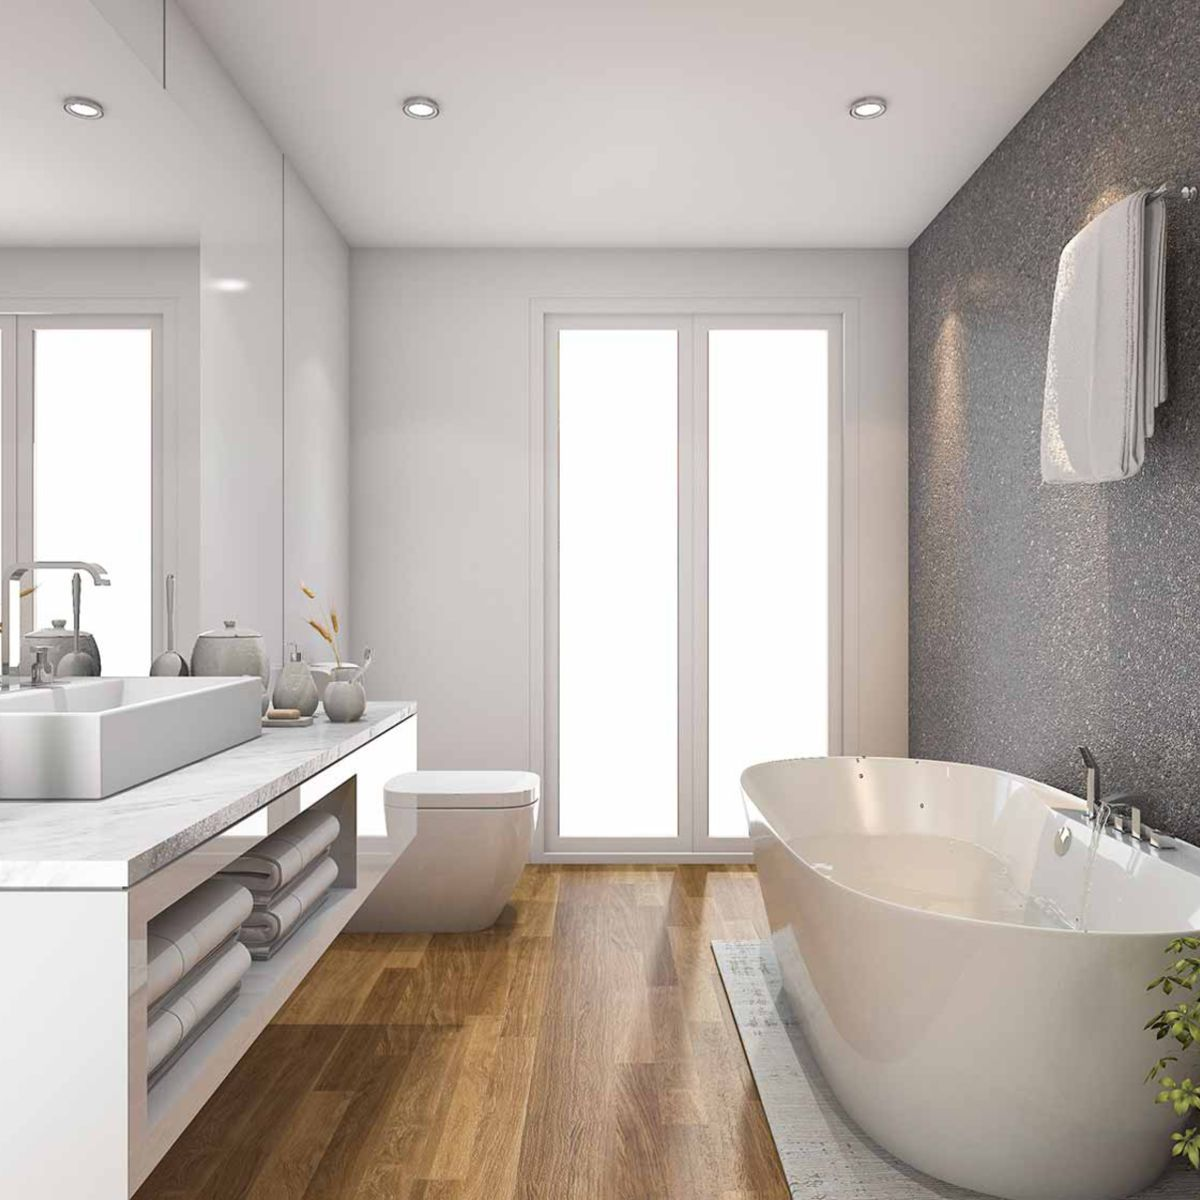 Relooker une salle de bain en 19  Rénovation salle de bain